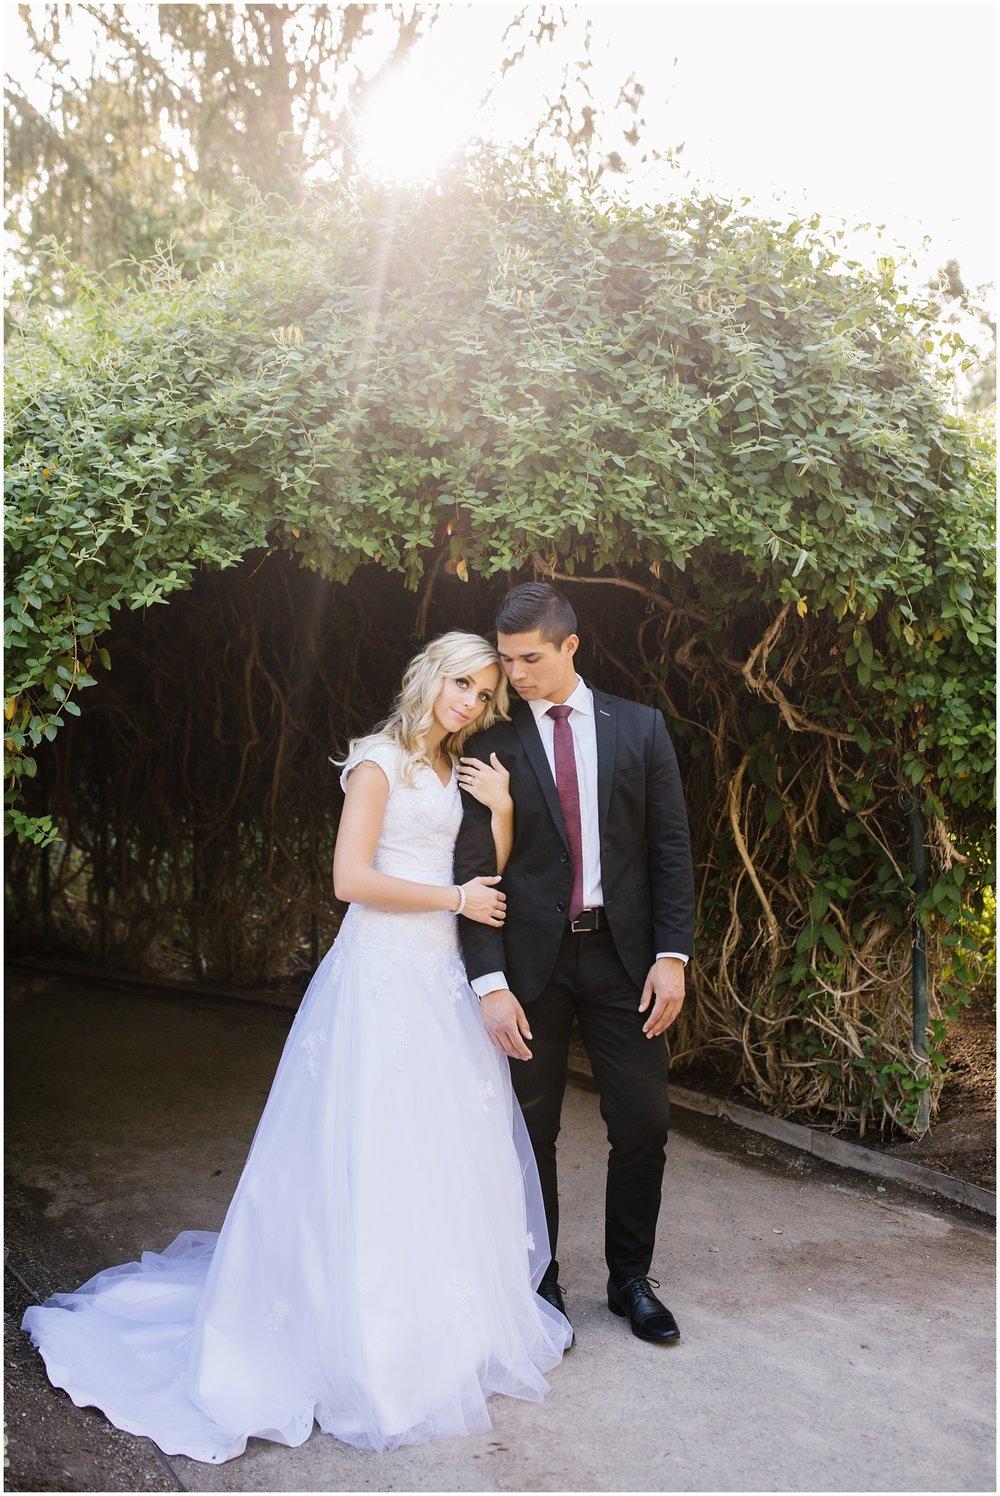 CHBridals-11_Lizzie-B-Imagery-Utah-Wedding-Photographer-Salt-Lake-City-Park-City-Thanksgiving-Point-Ashton-Gardens.jpg